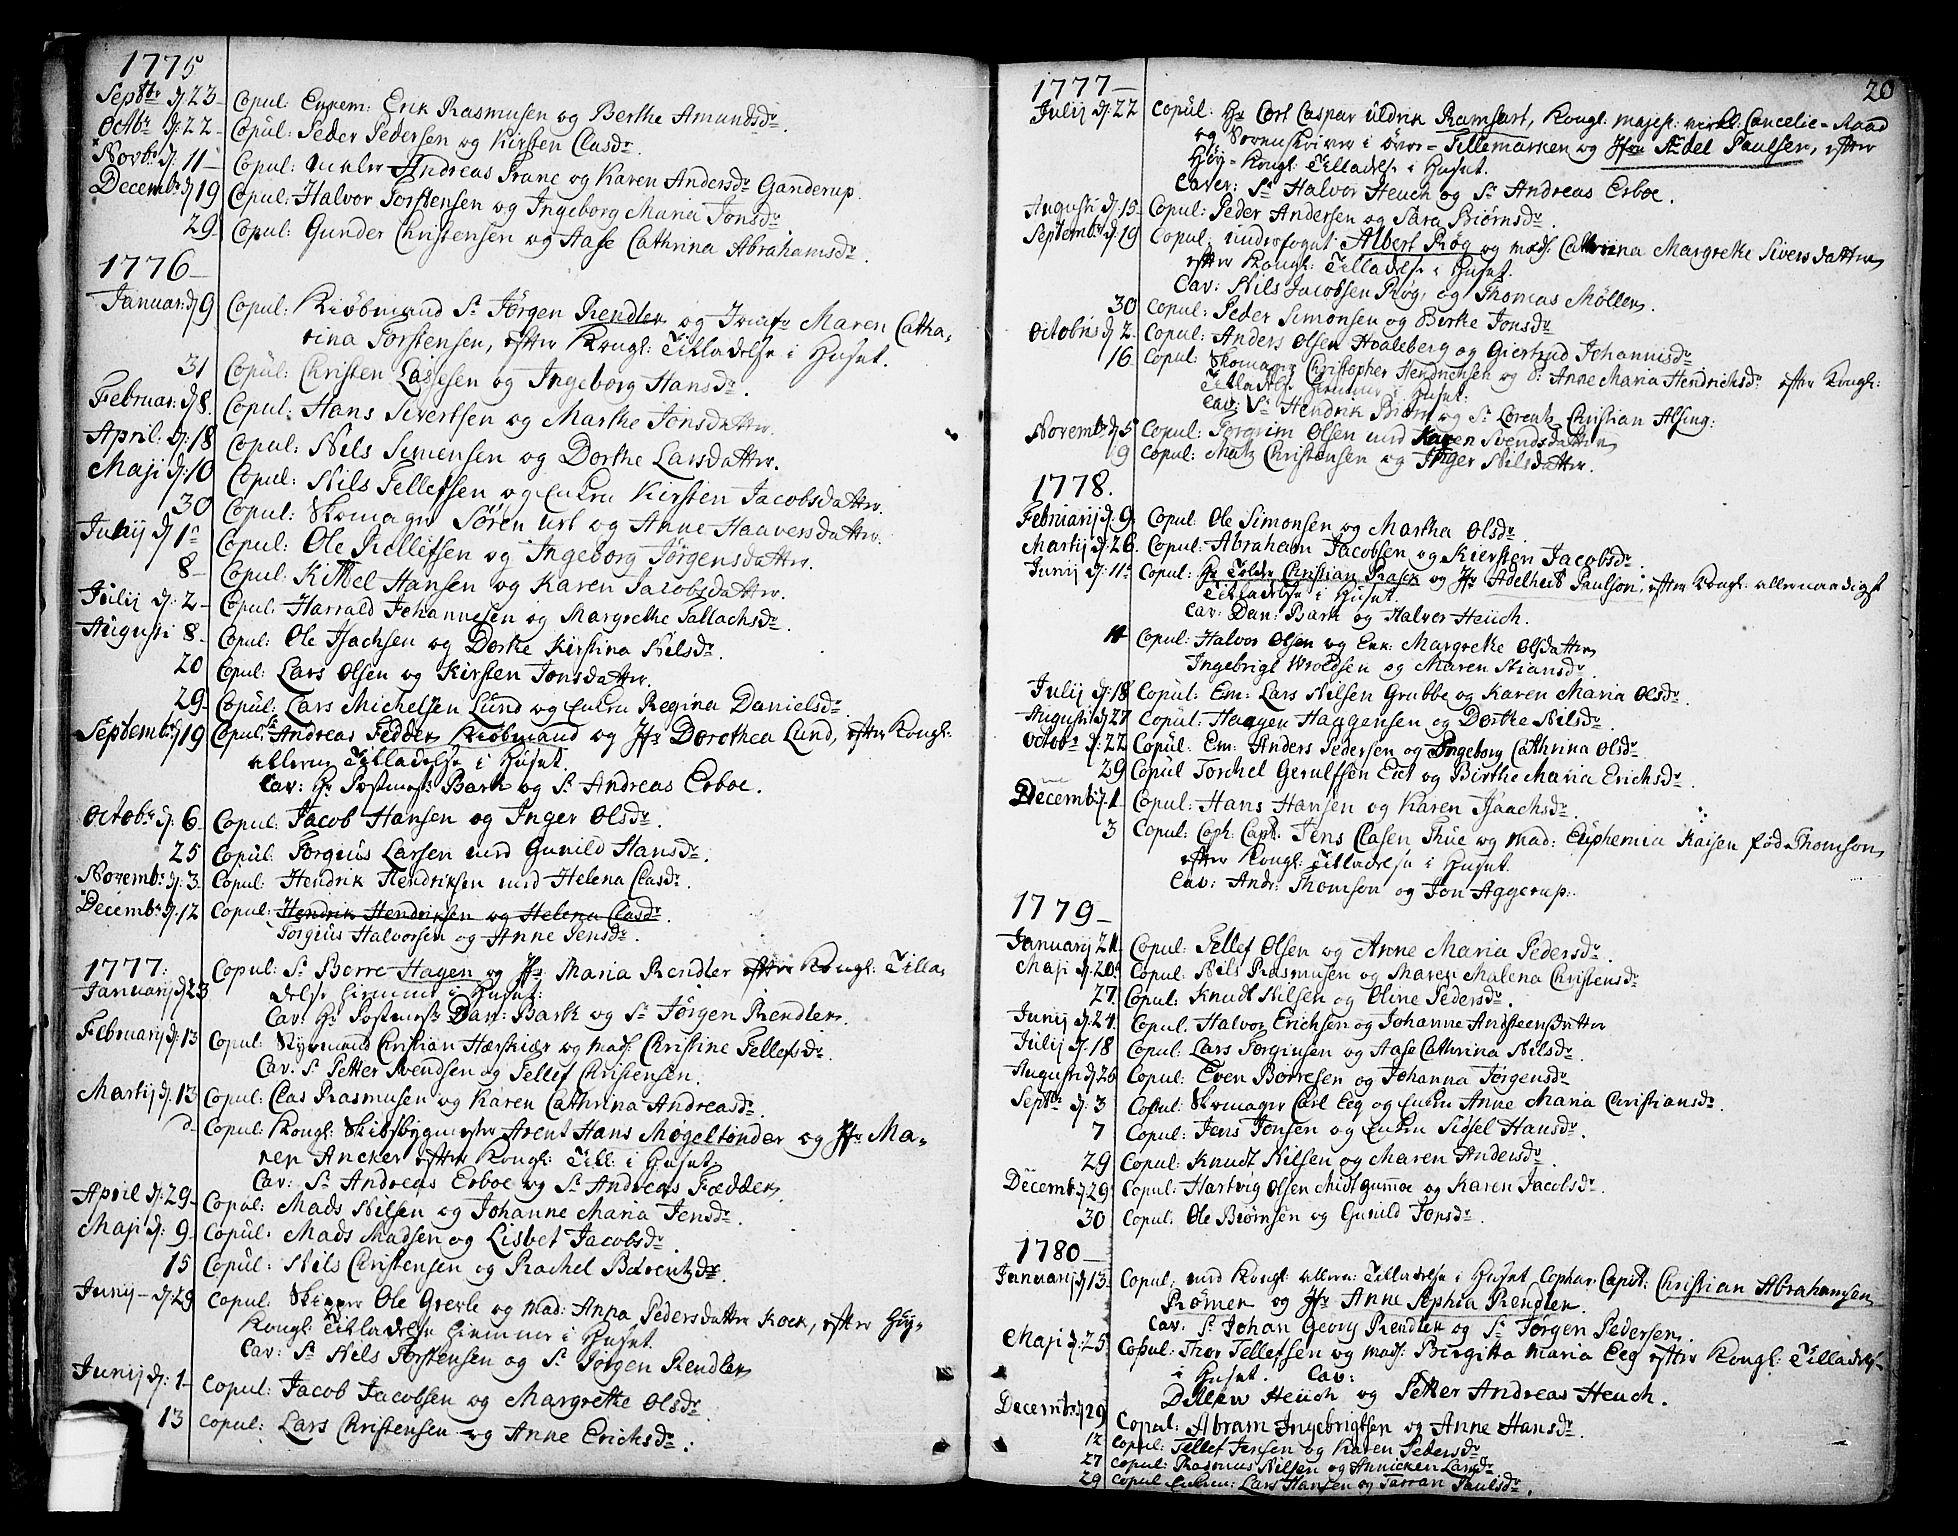 SAKO, Kragerø kirkebøker, F/Fa/L0002: Ministerialbok nr. 2, 1767-1802, s. 20